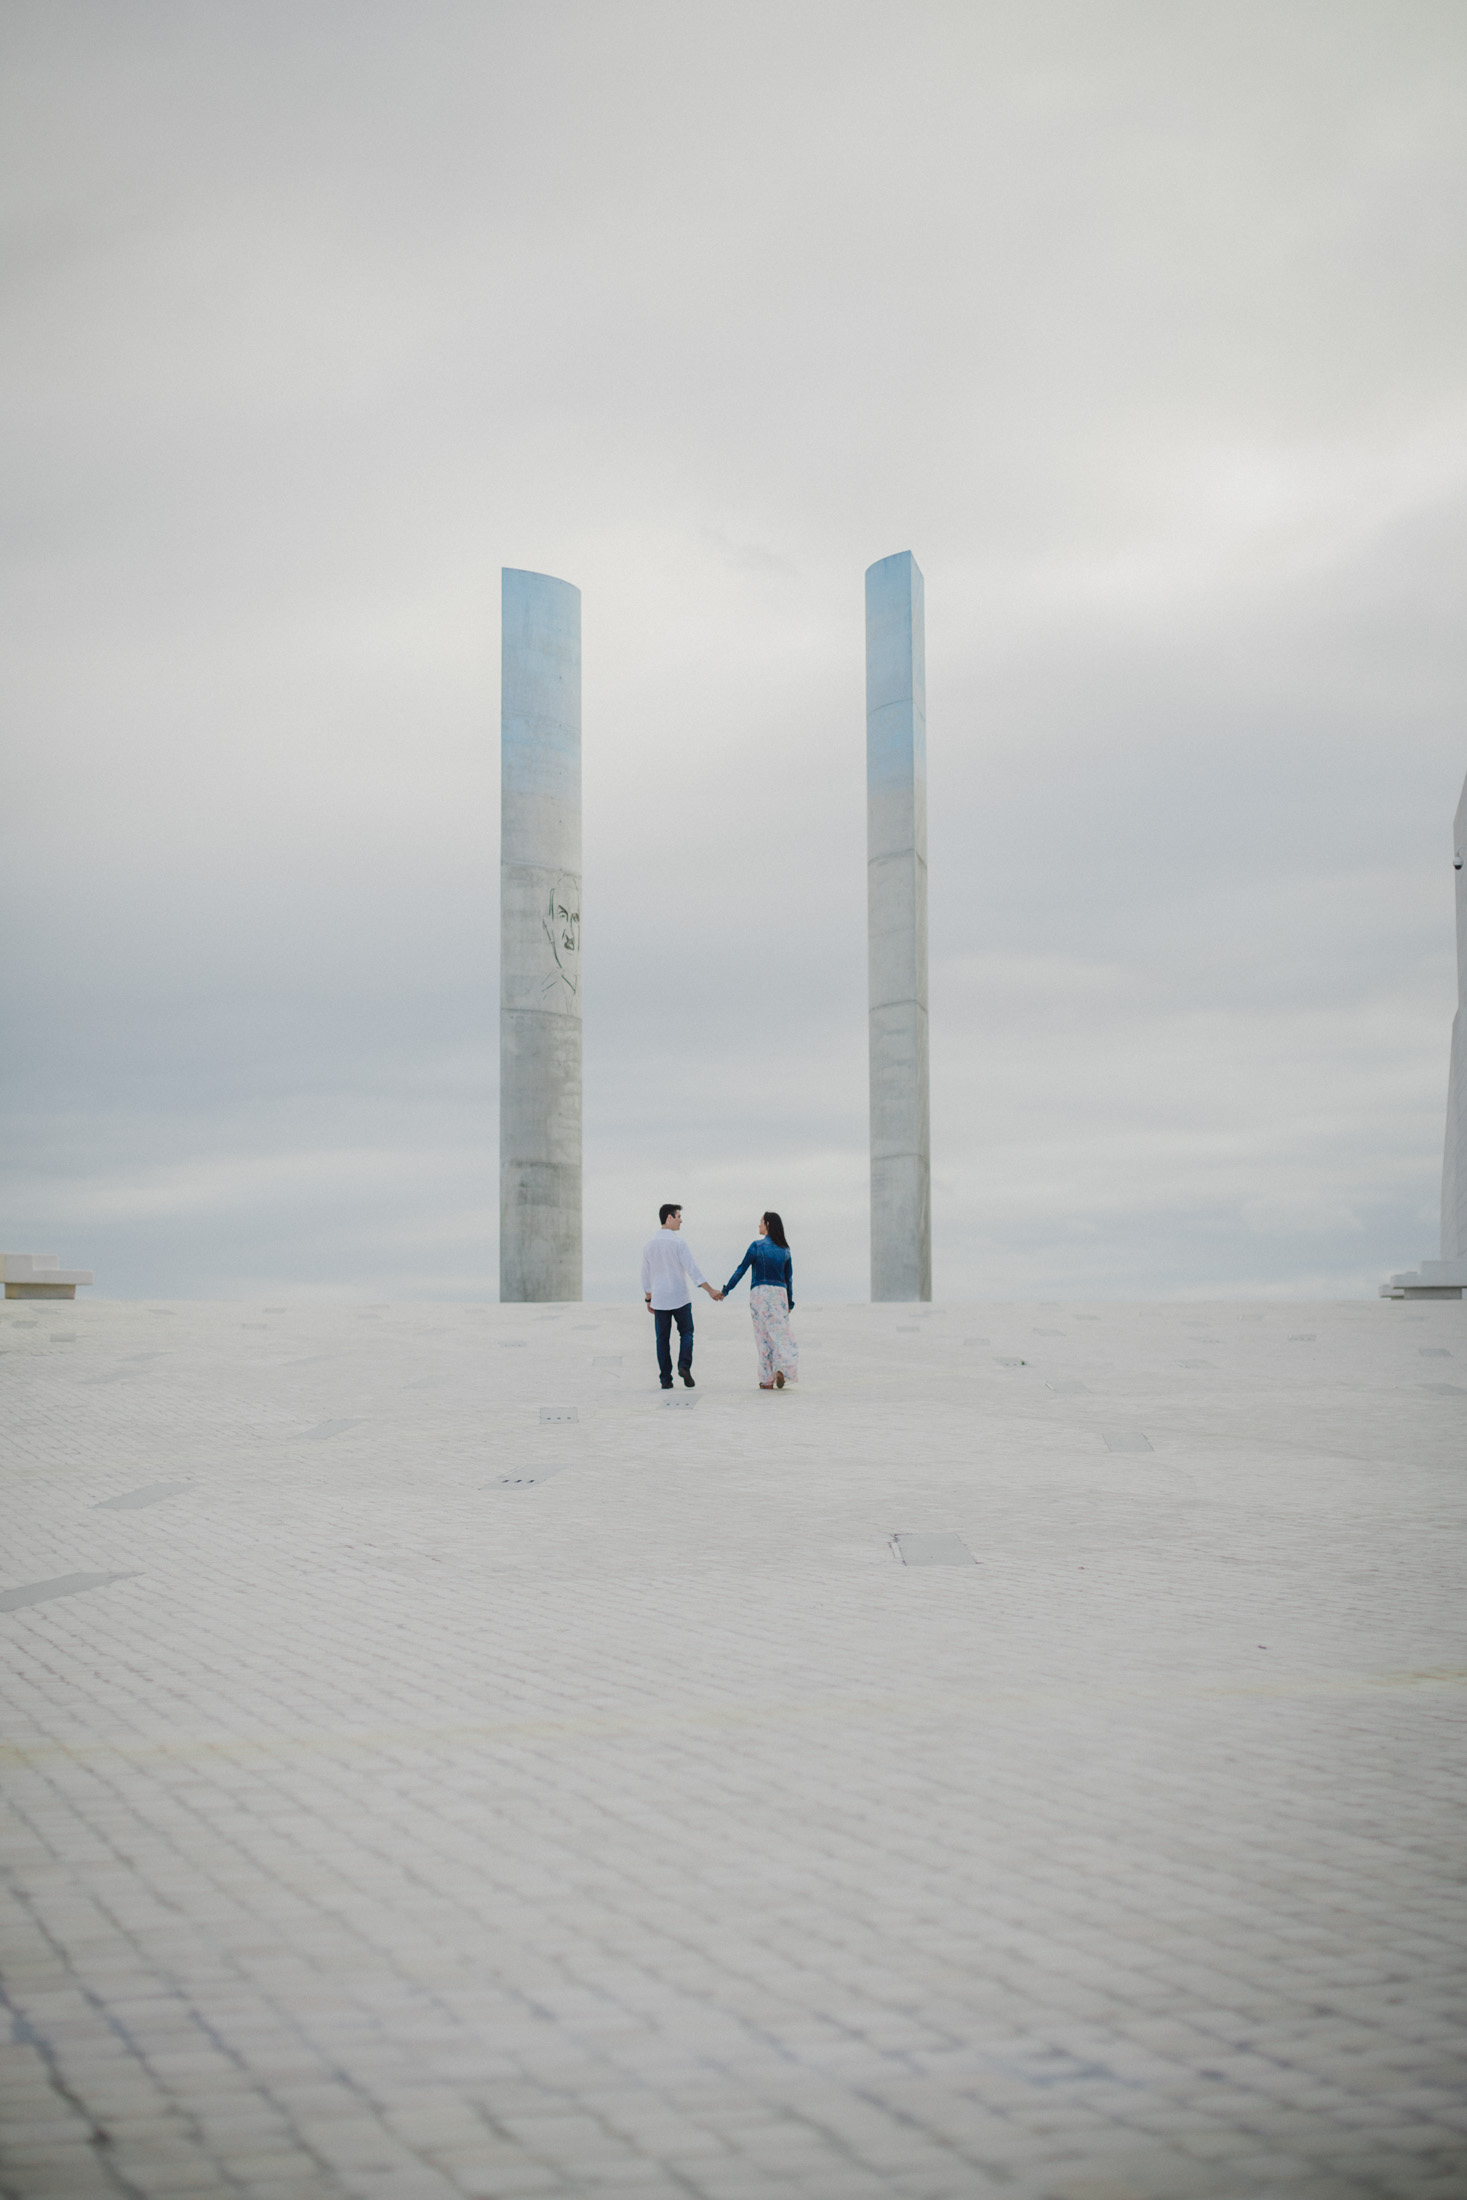 16 engagement-love-session-fundacao-Champalimaud-Filipe-Santiago-Fotografia-Lisboa-Mafra-Malveira-Fotografo